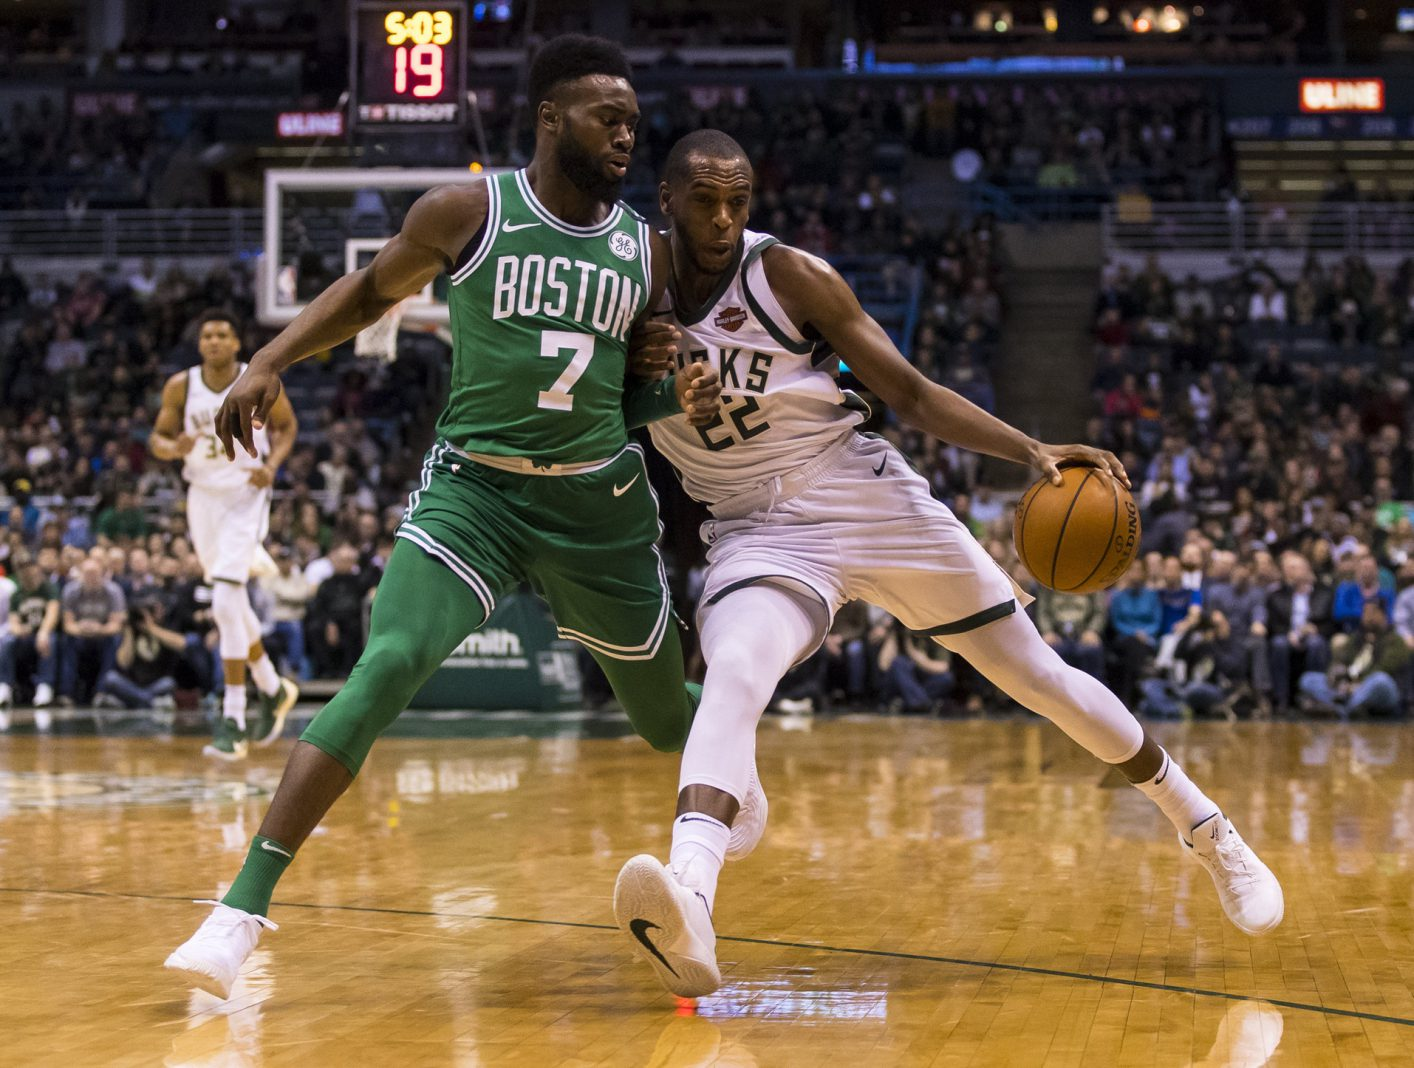 Recap: Shorthanded Celtics smacked around in paint vs. Bucks